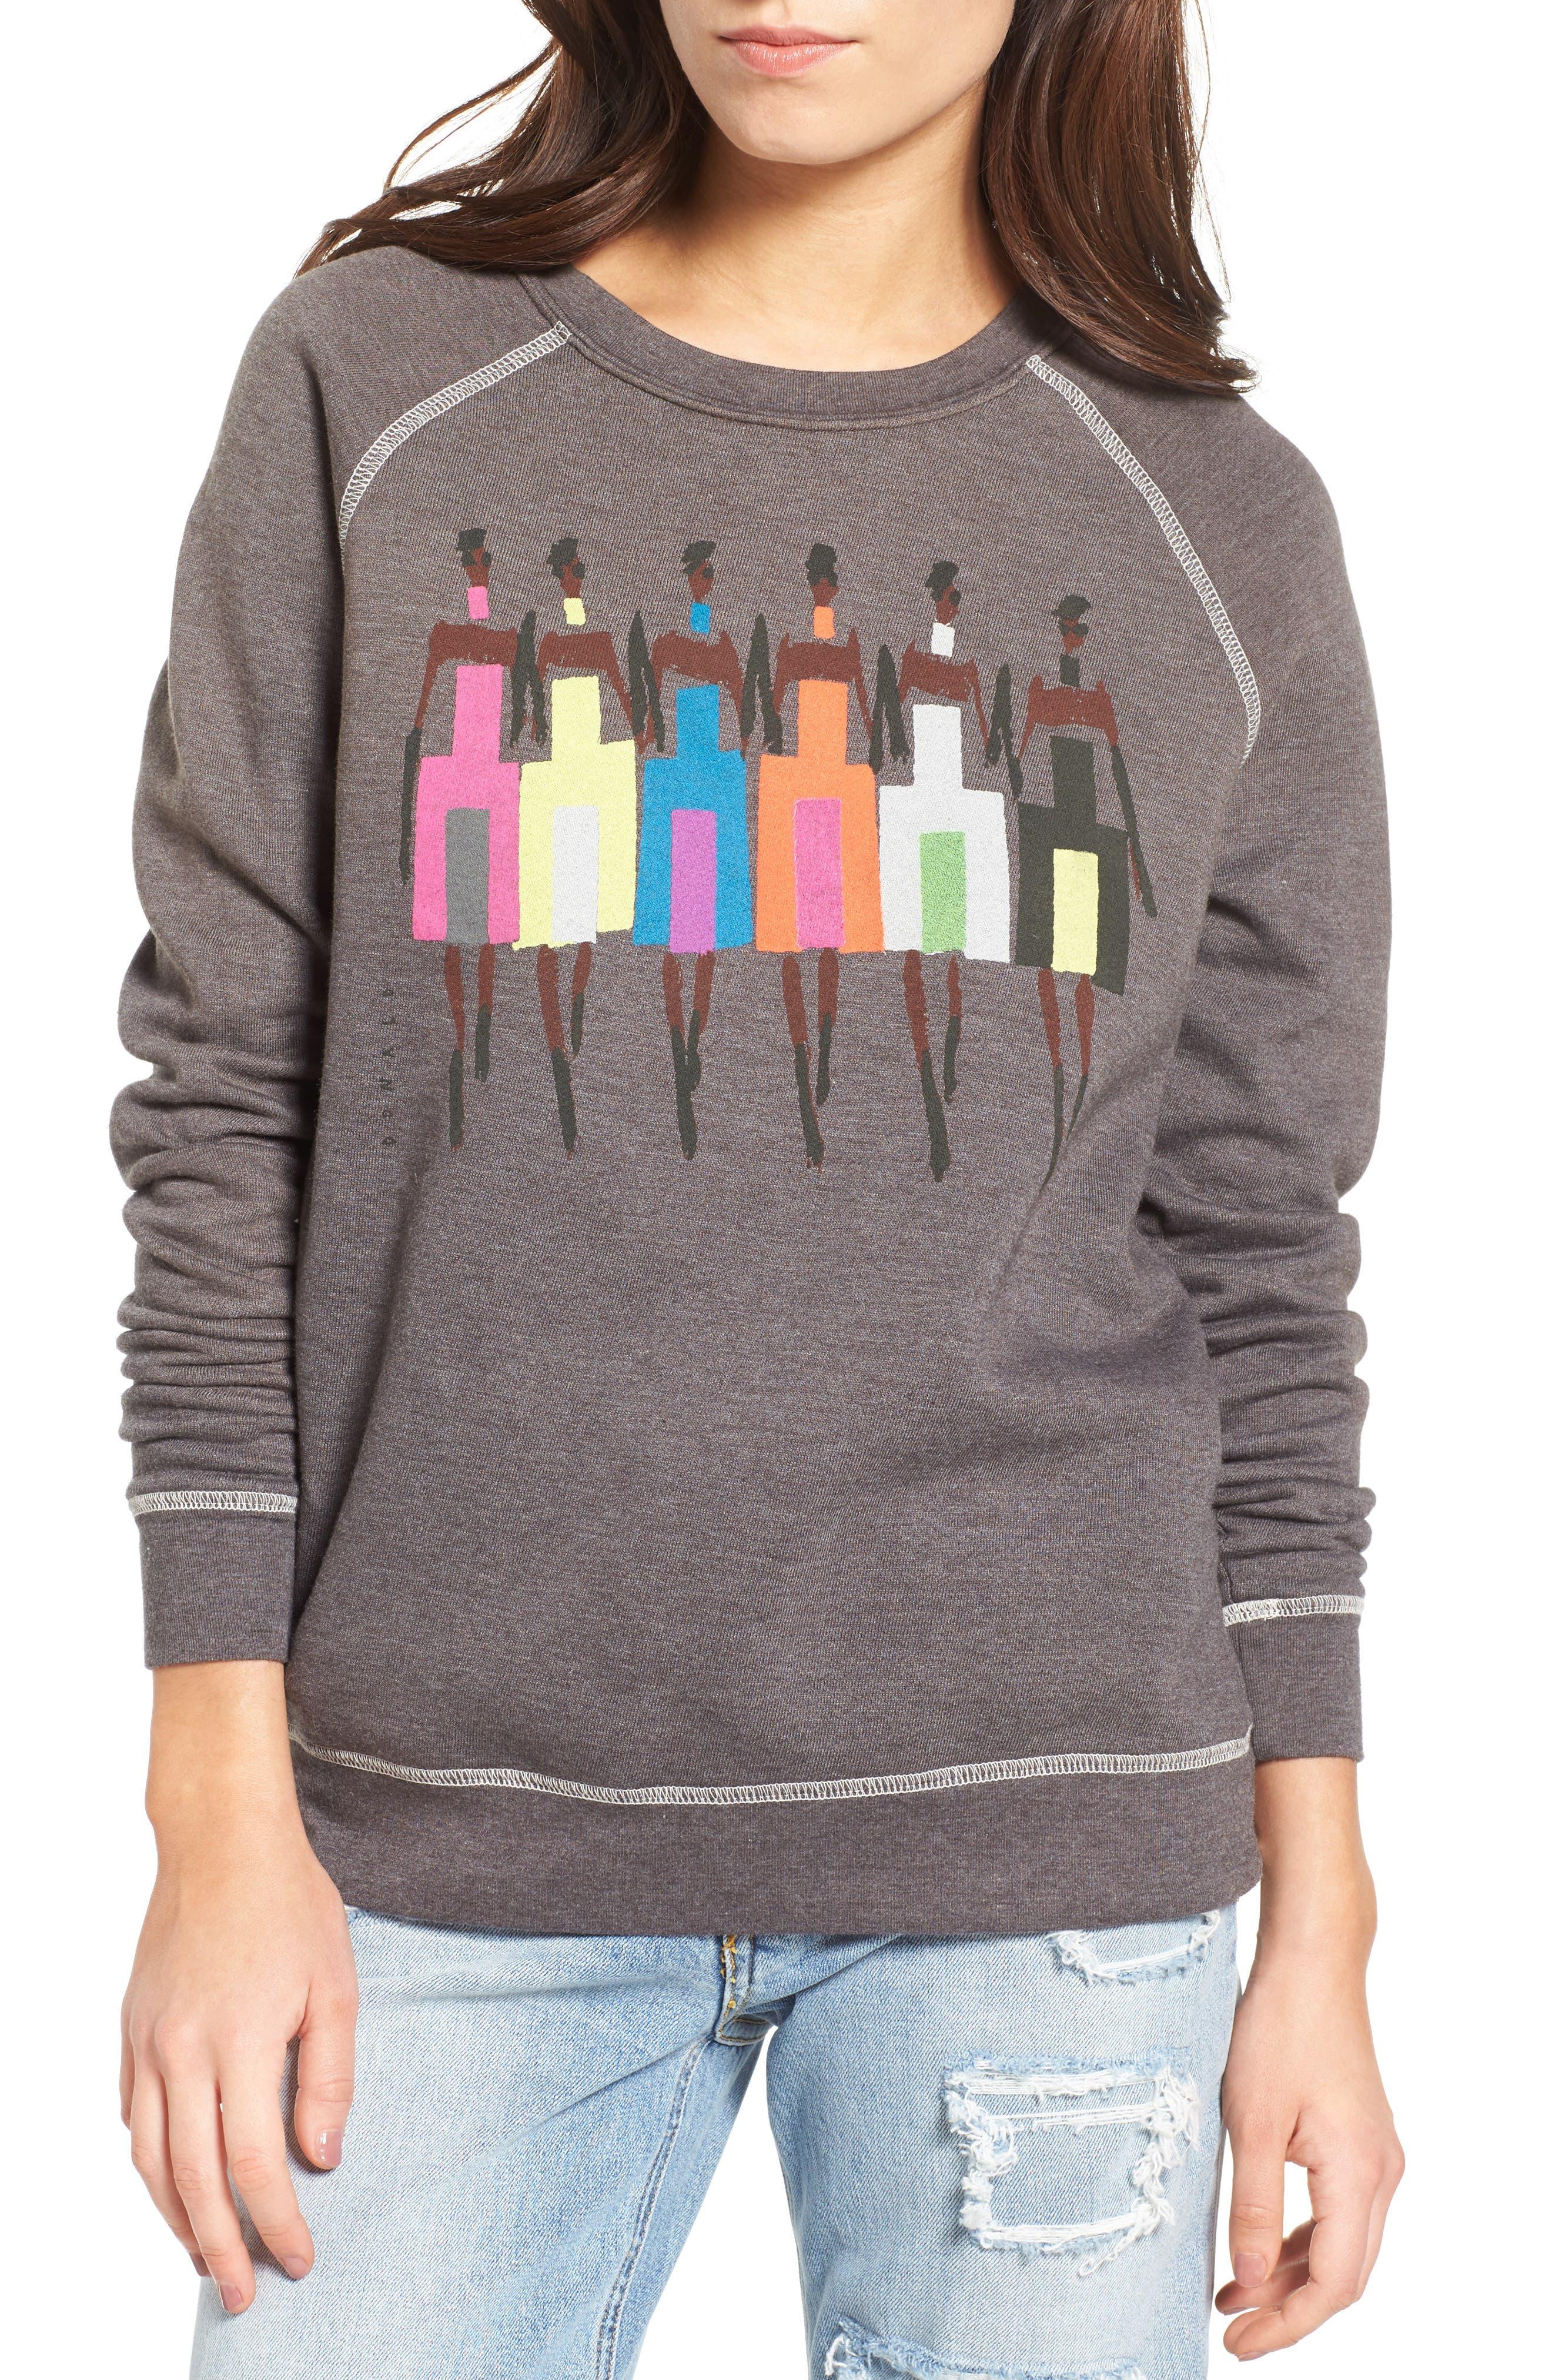 Alternate Image 1 Selected - Junk Food Donald Robertson Girls Sweatshirt